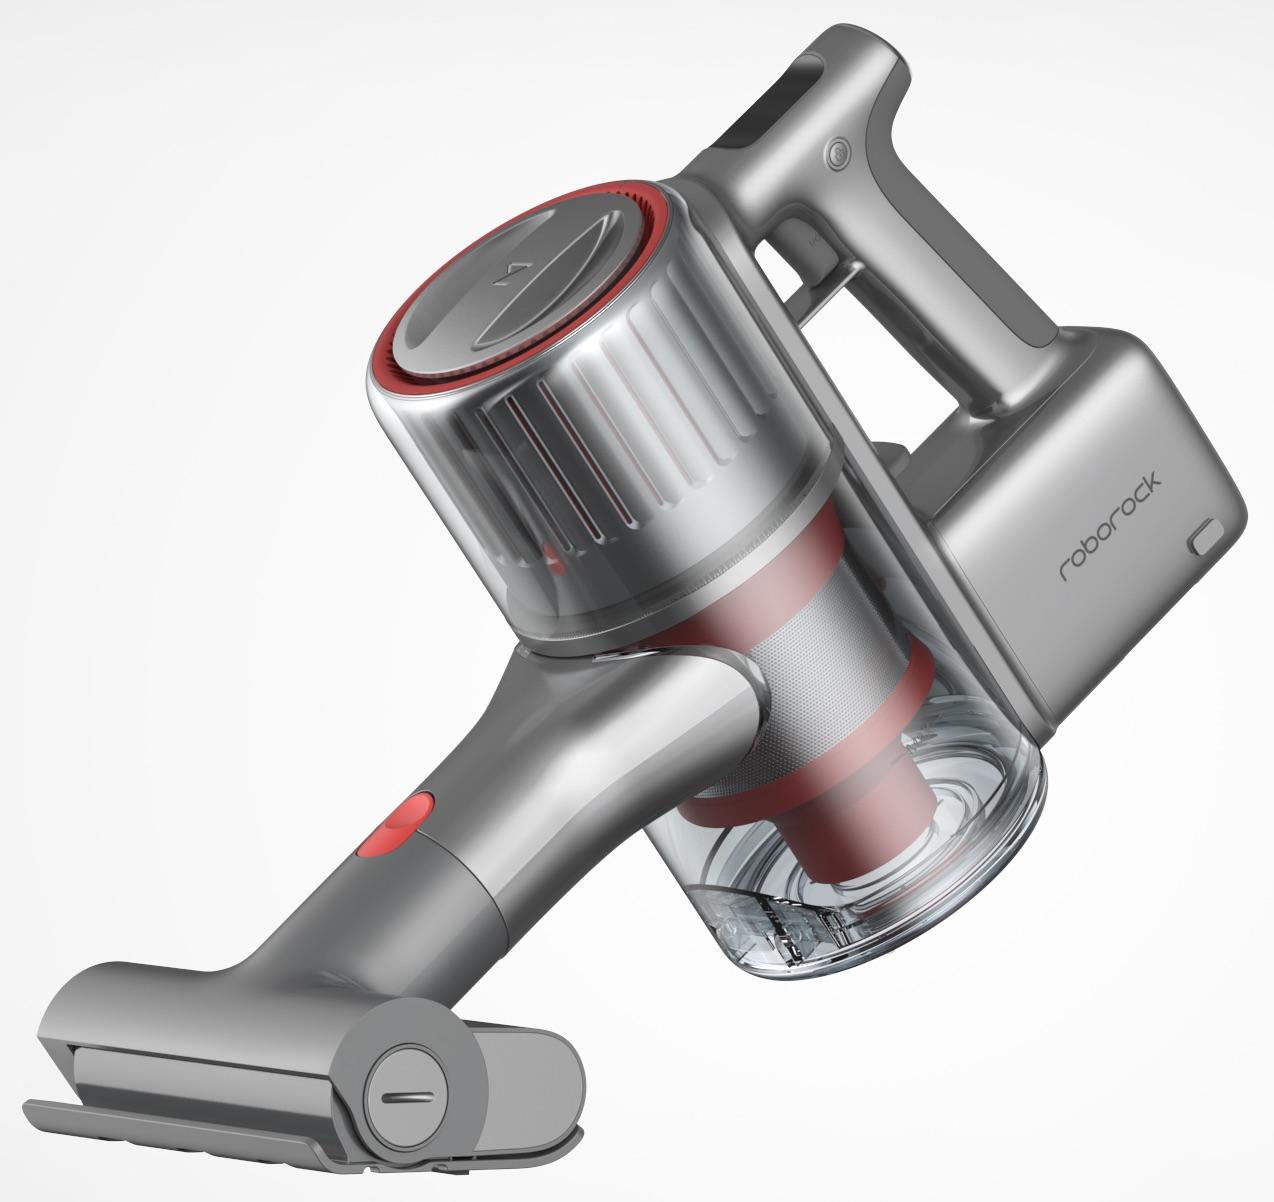 Roborock H6 Adapt à venda